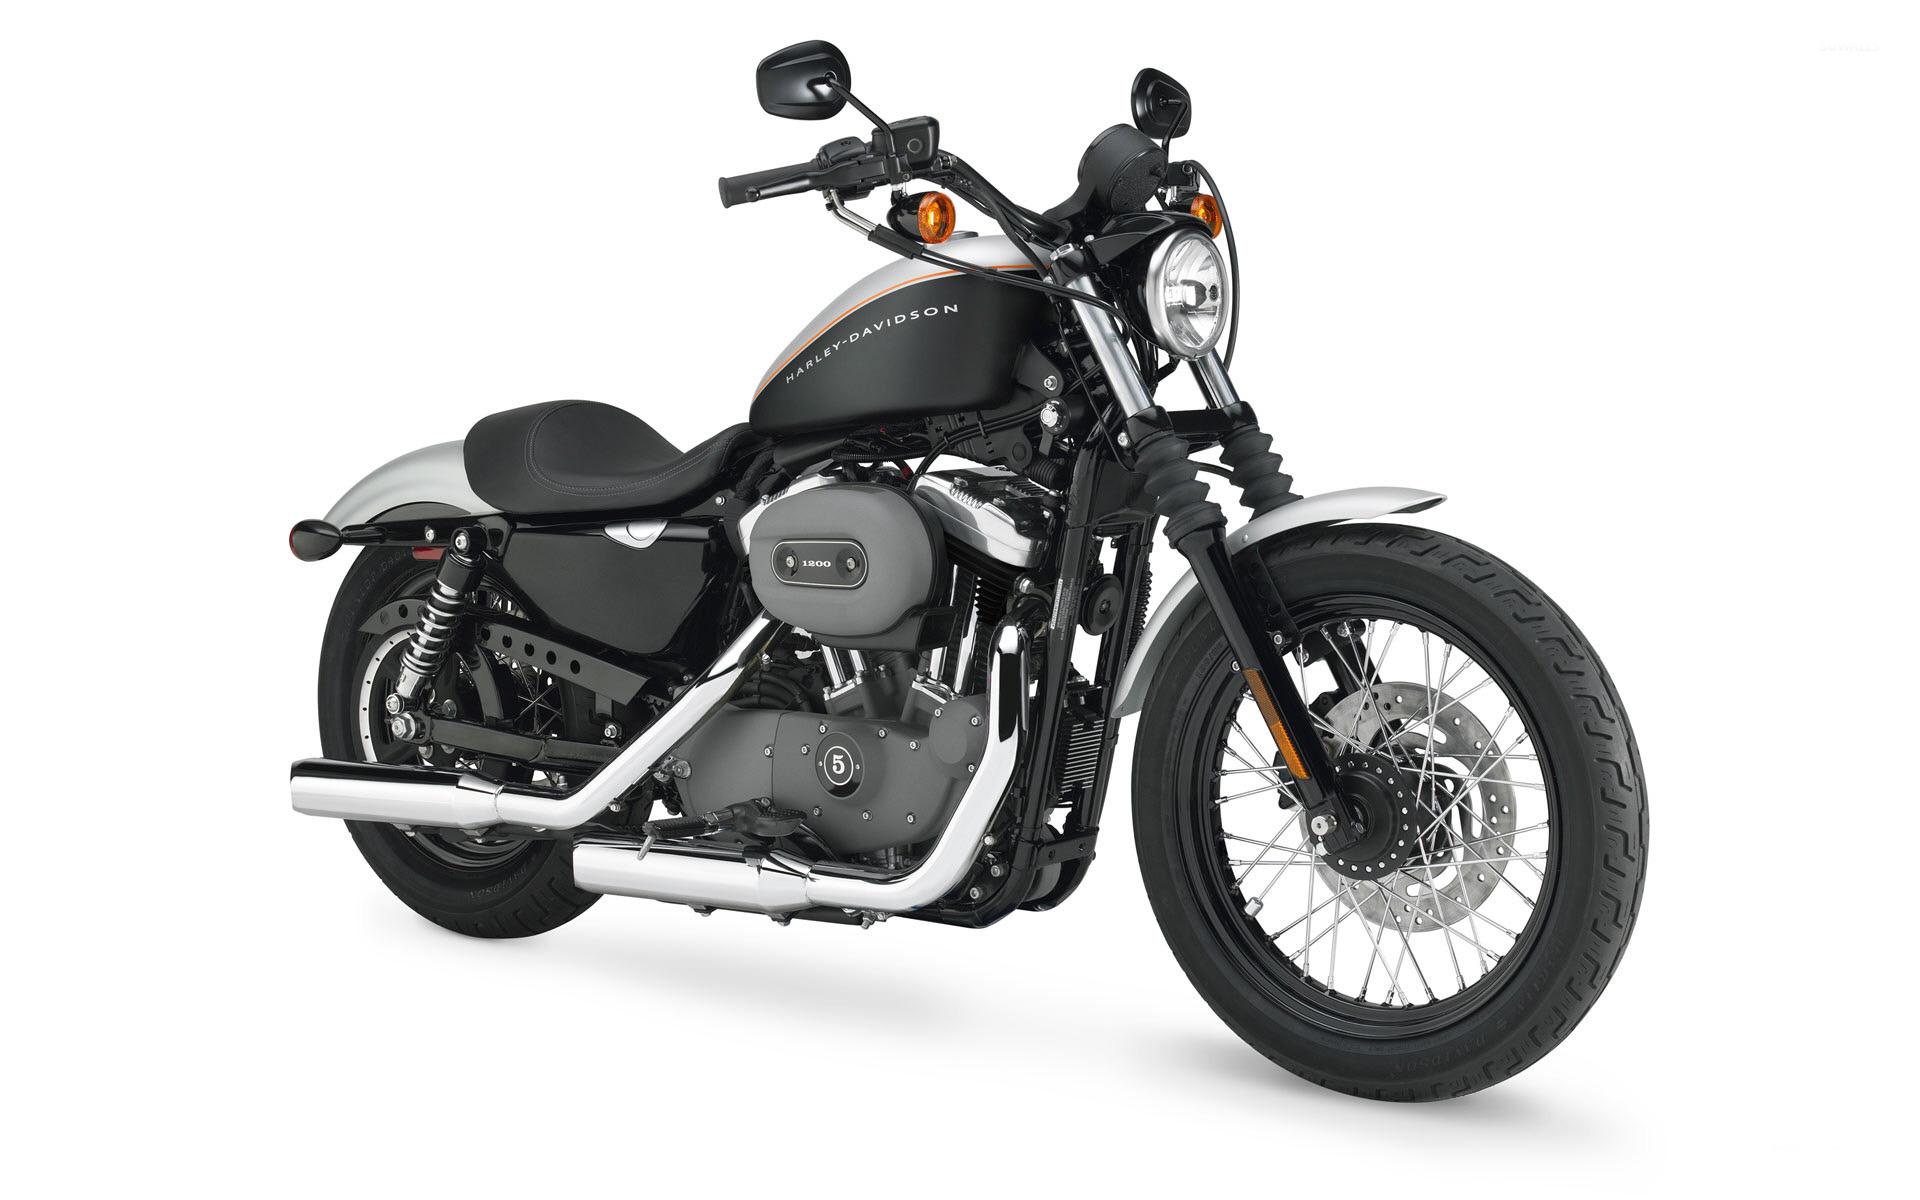 Harley Davidson Sportster Iron 883 Wallpaper Motorcycle Wallpapers